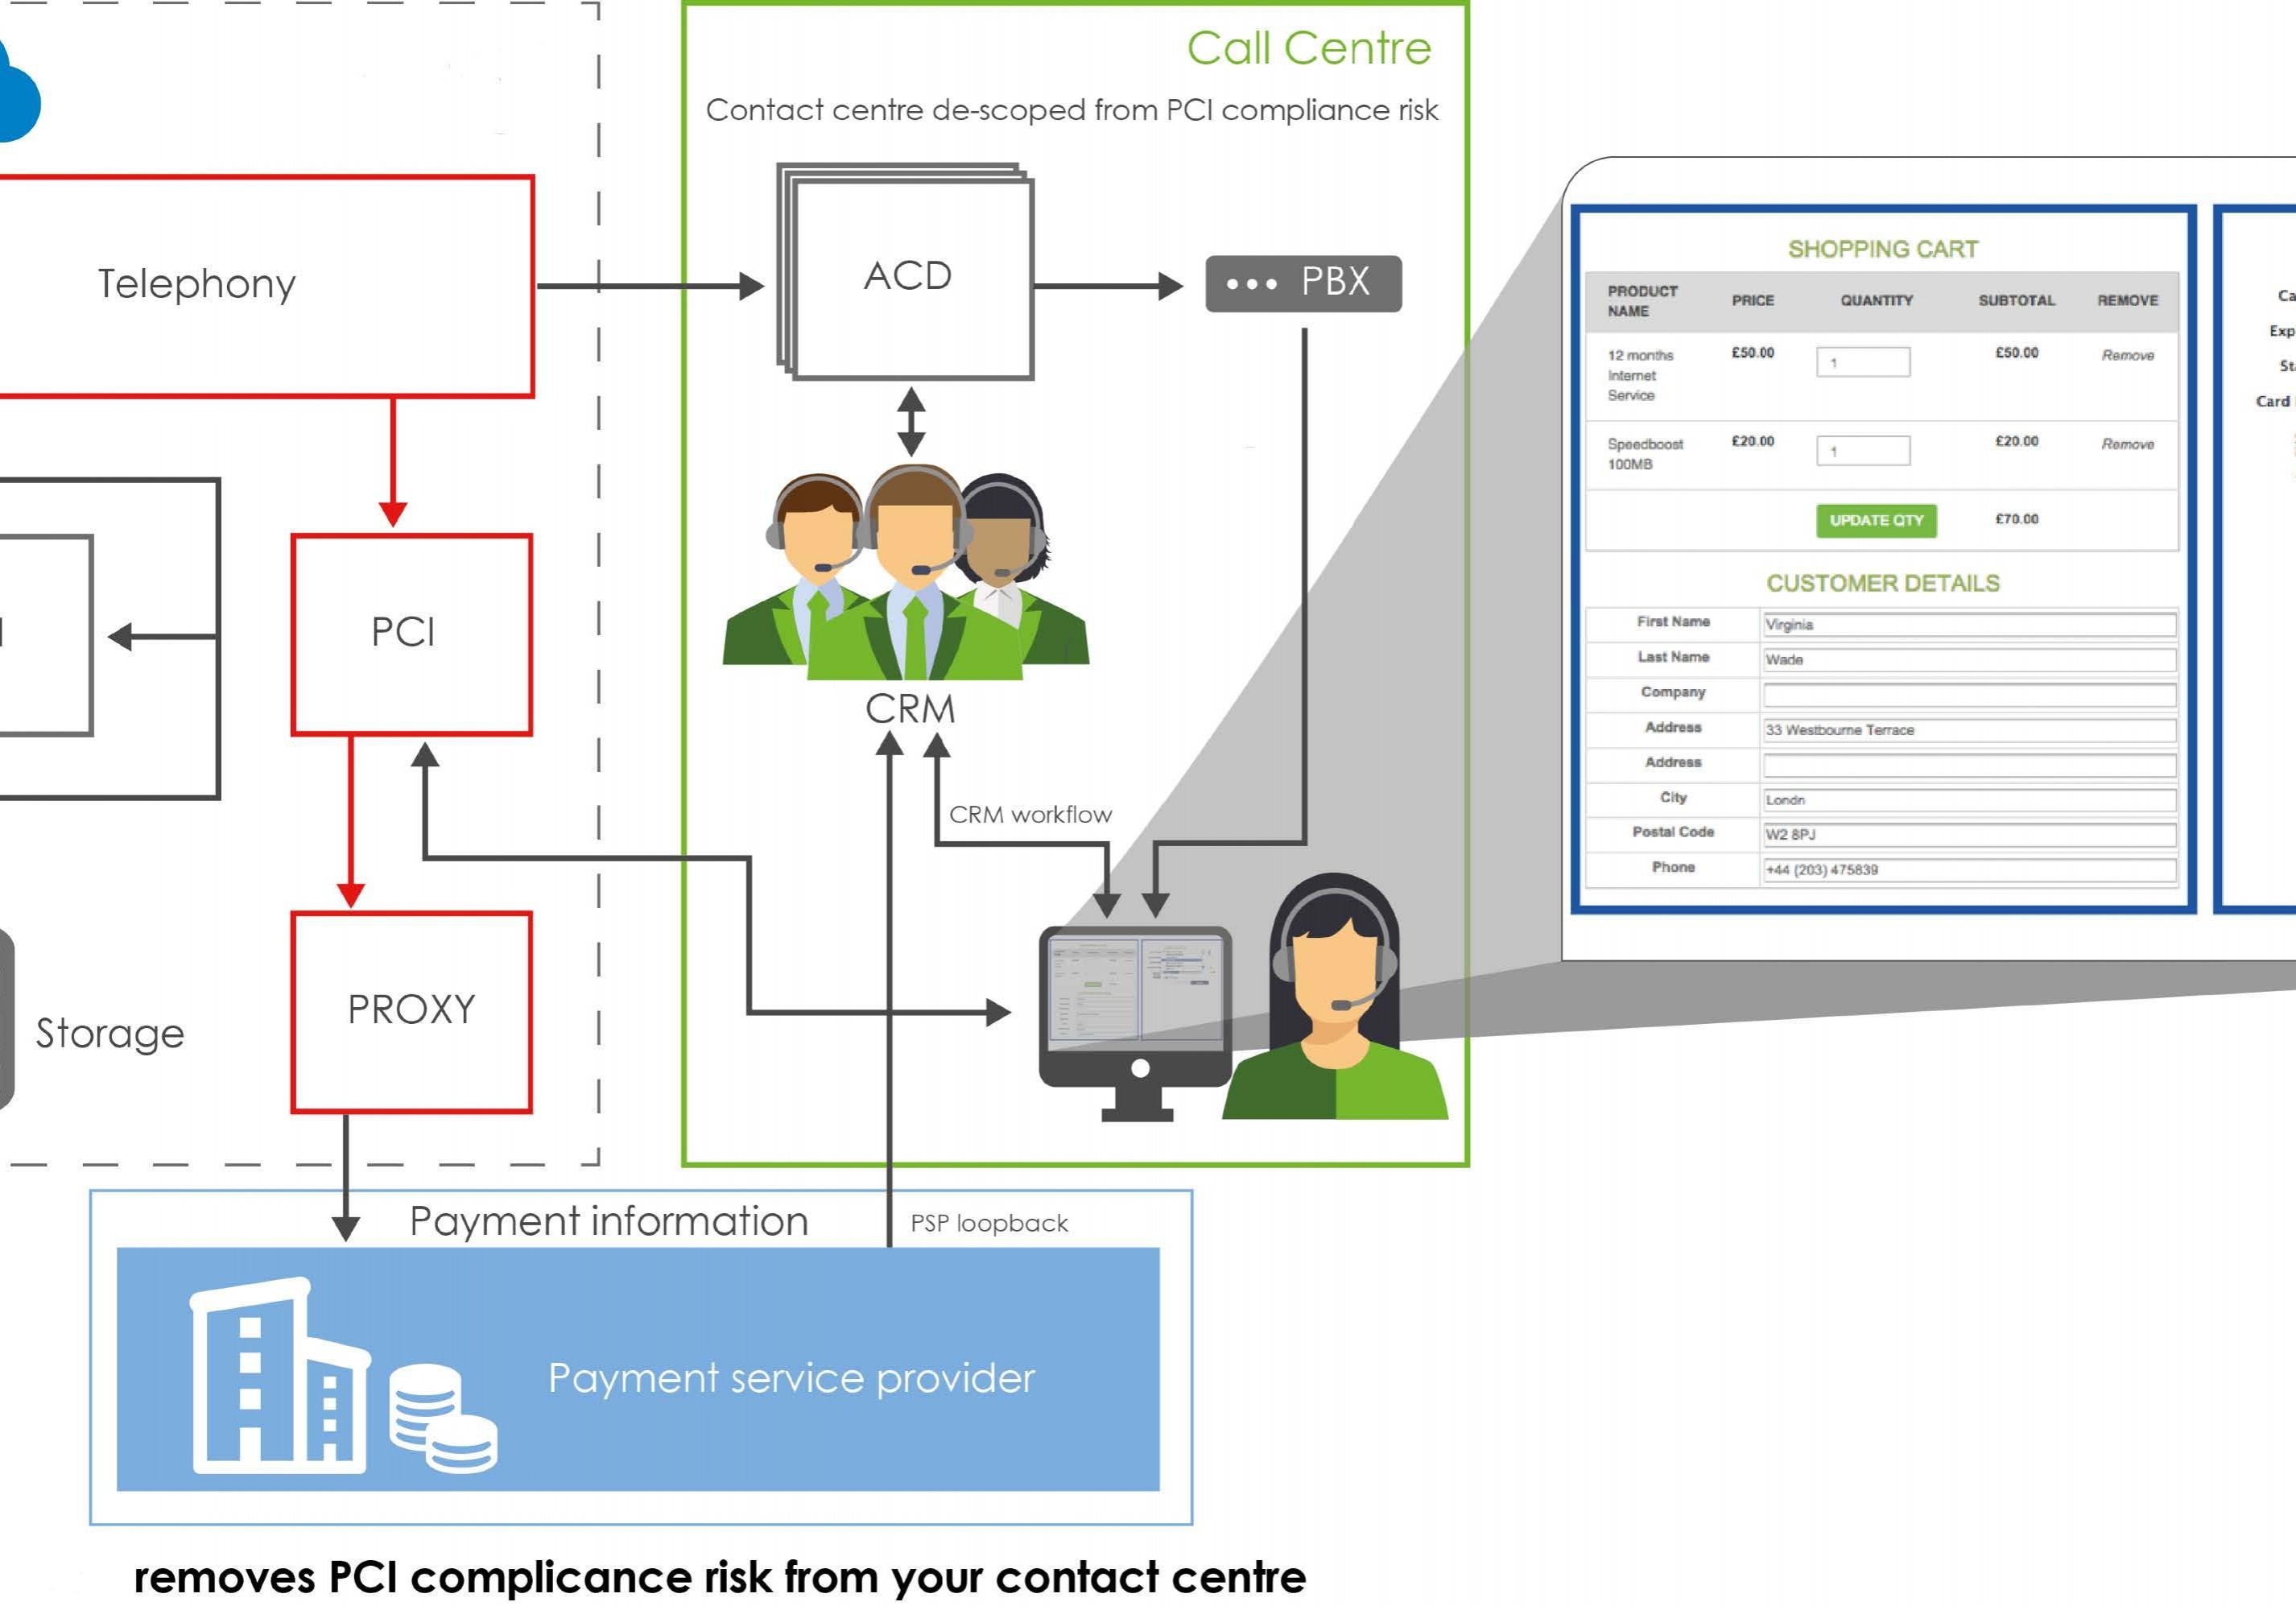 PCI-COMPLIANCE-IMAGE